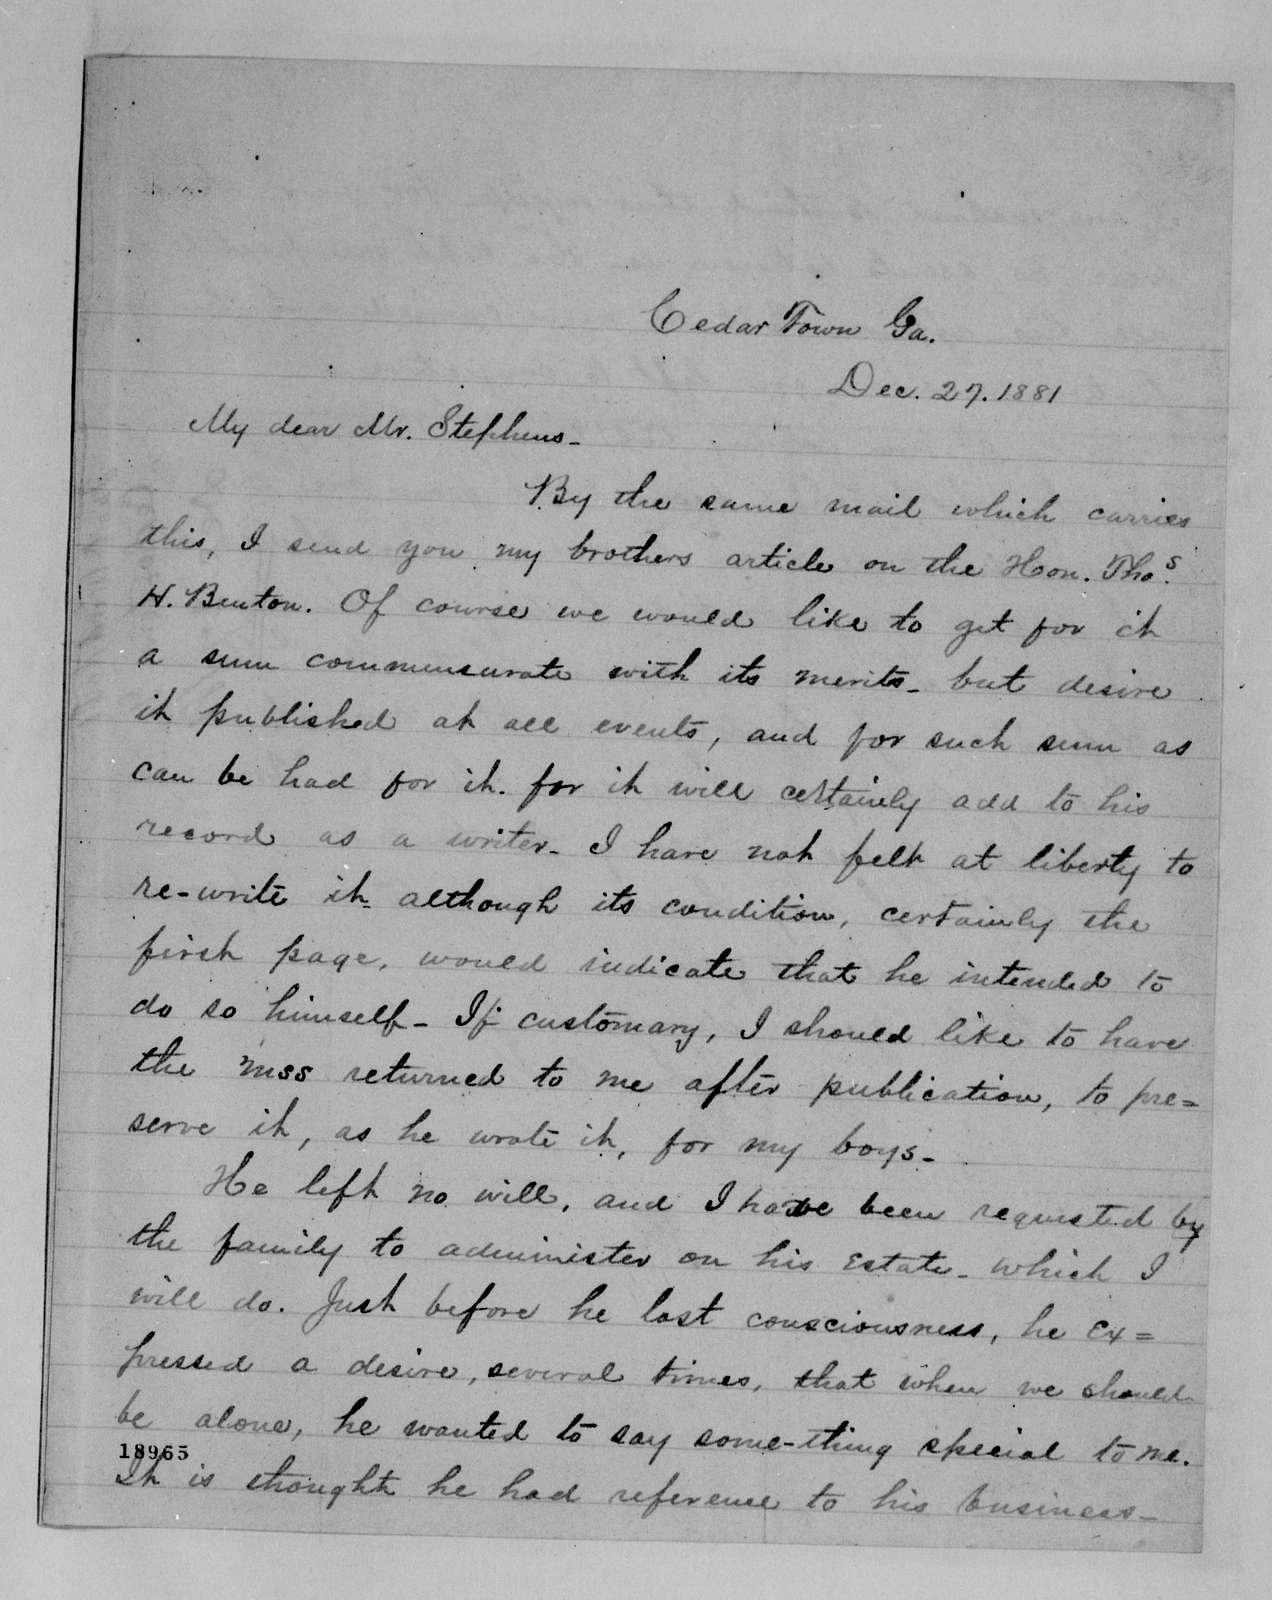 Alexander Hamilton Stephens Papers: General Correspondence, 1784-1886; 1881, July 30-1882, Mar. 4